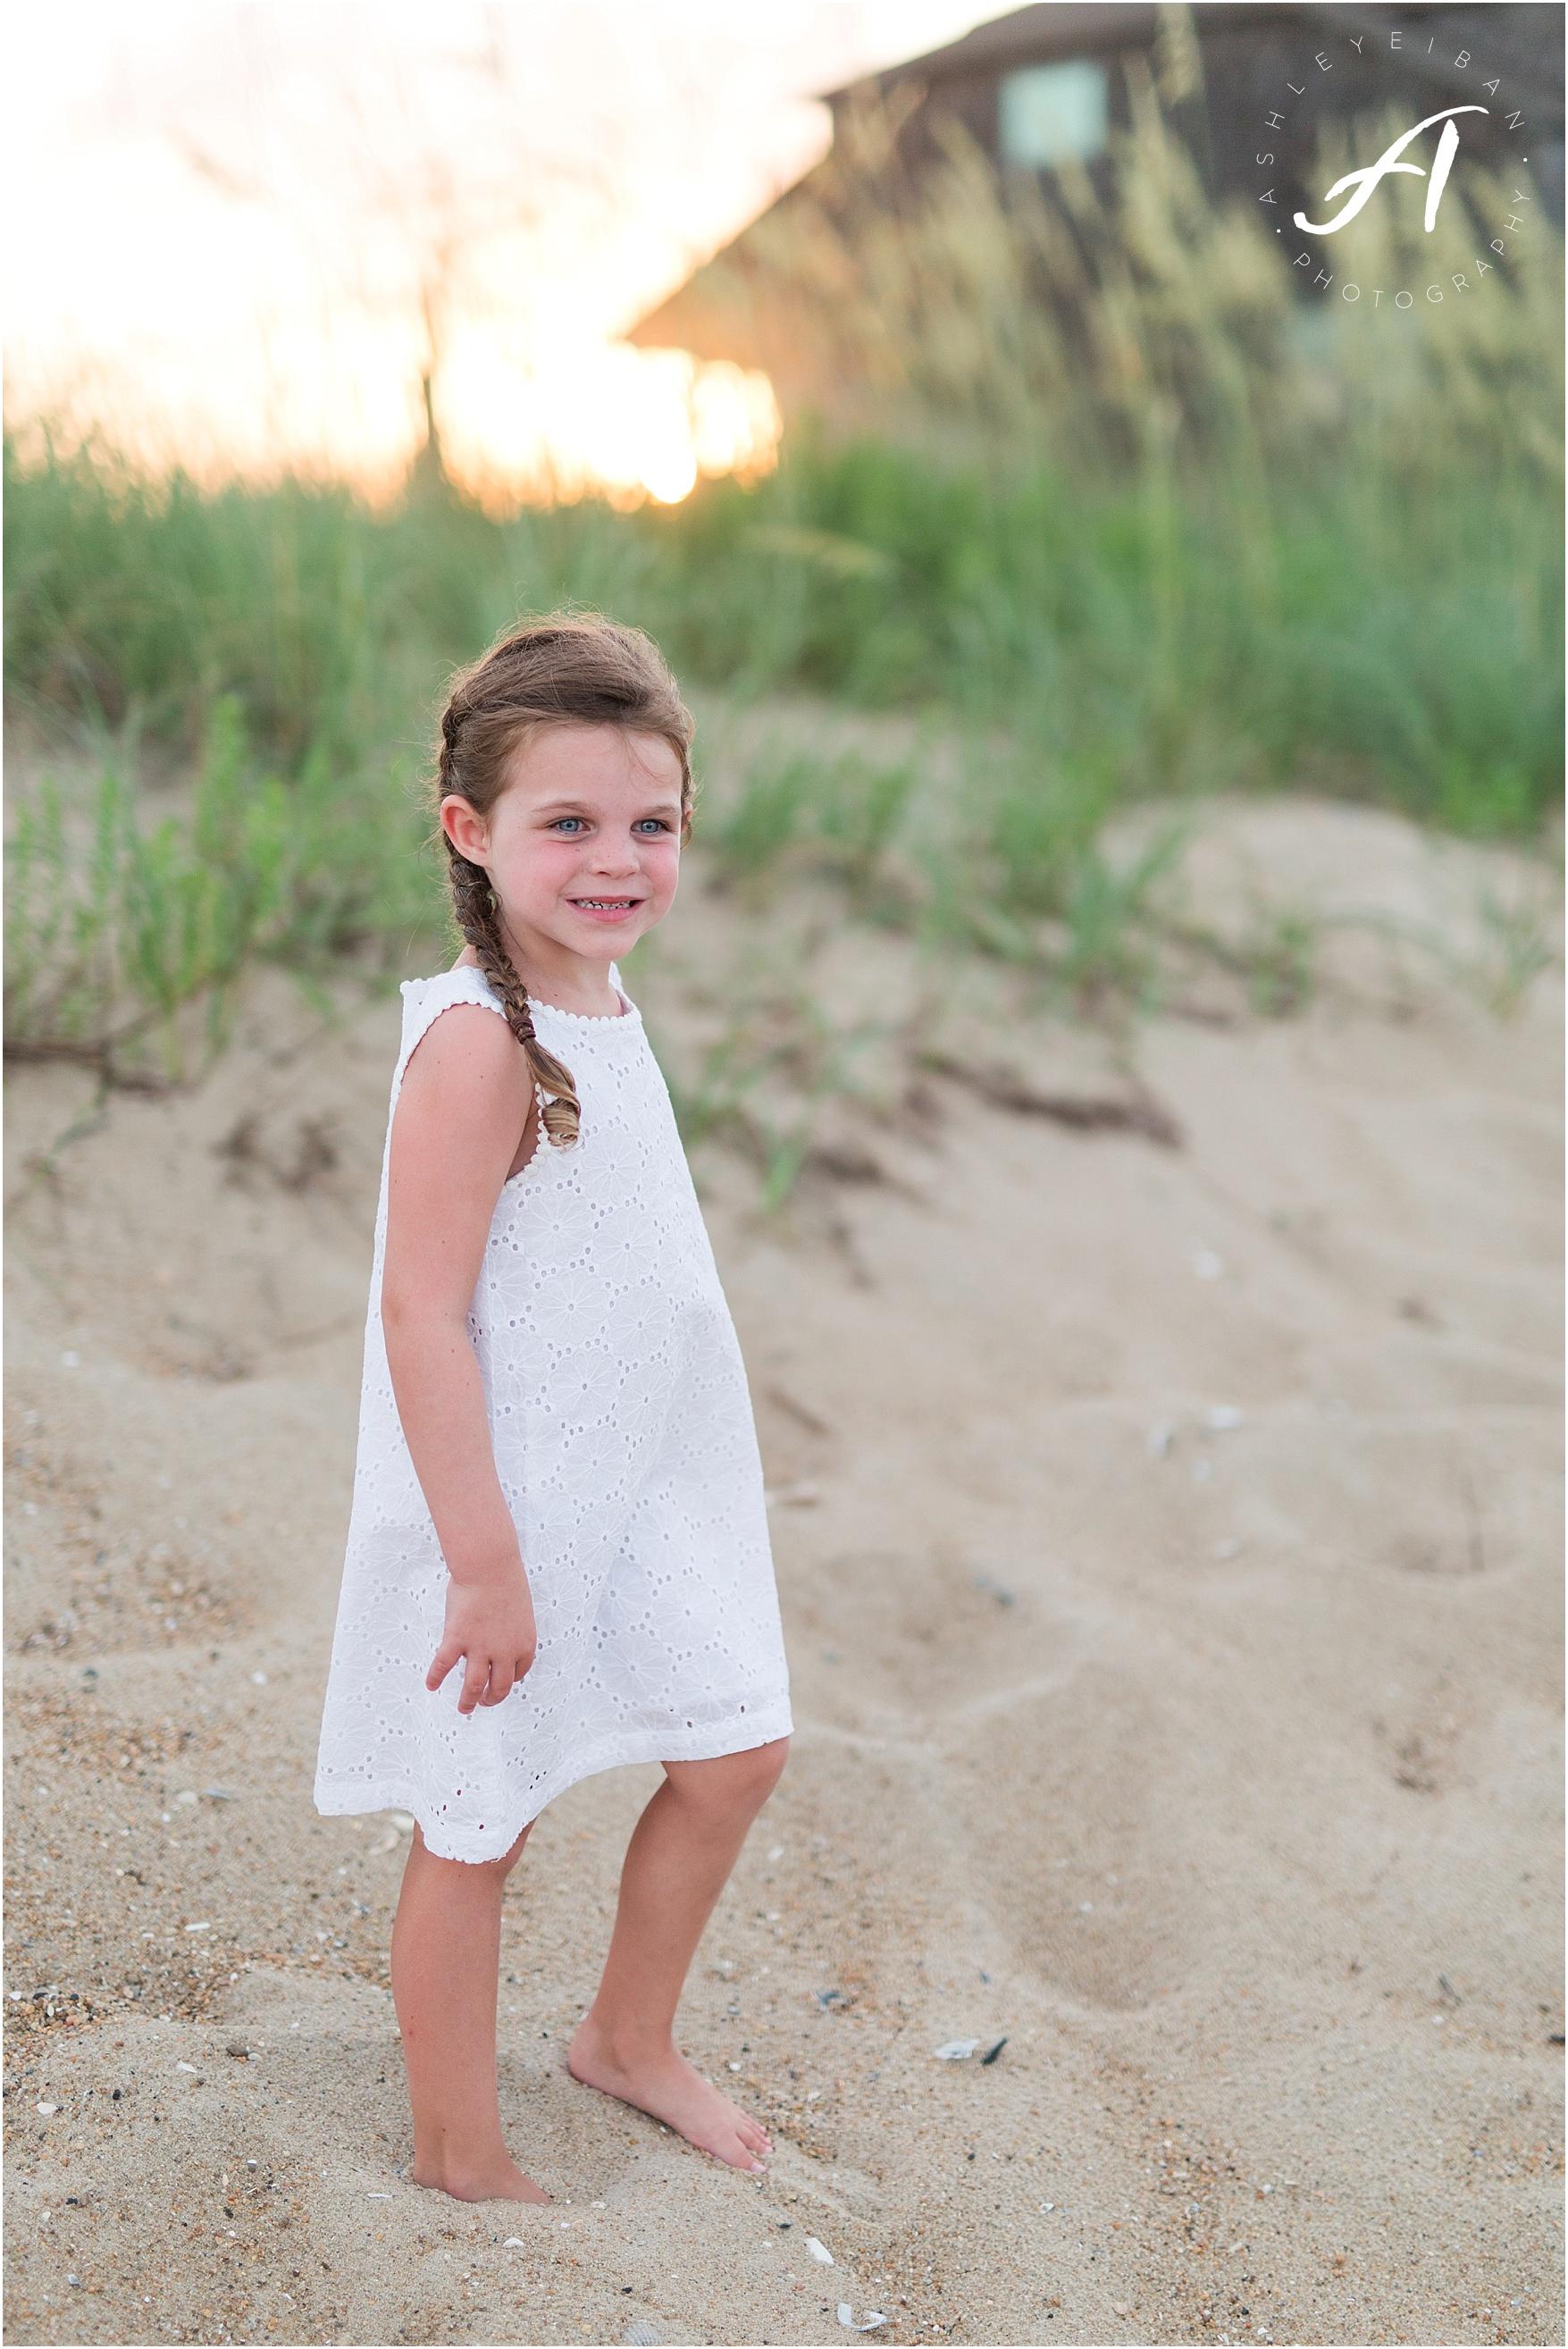 Outer Banks Wedding and Family Photographer || Ashley Eiban Photography || www.ashleyeiban.com